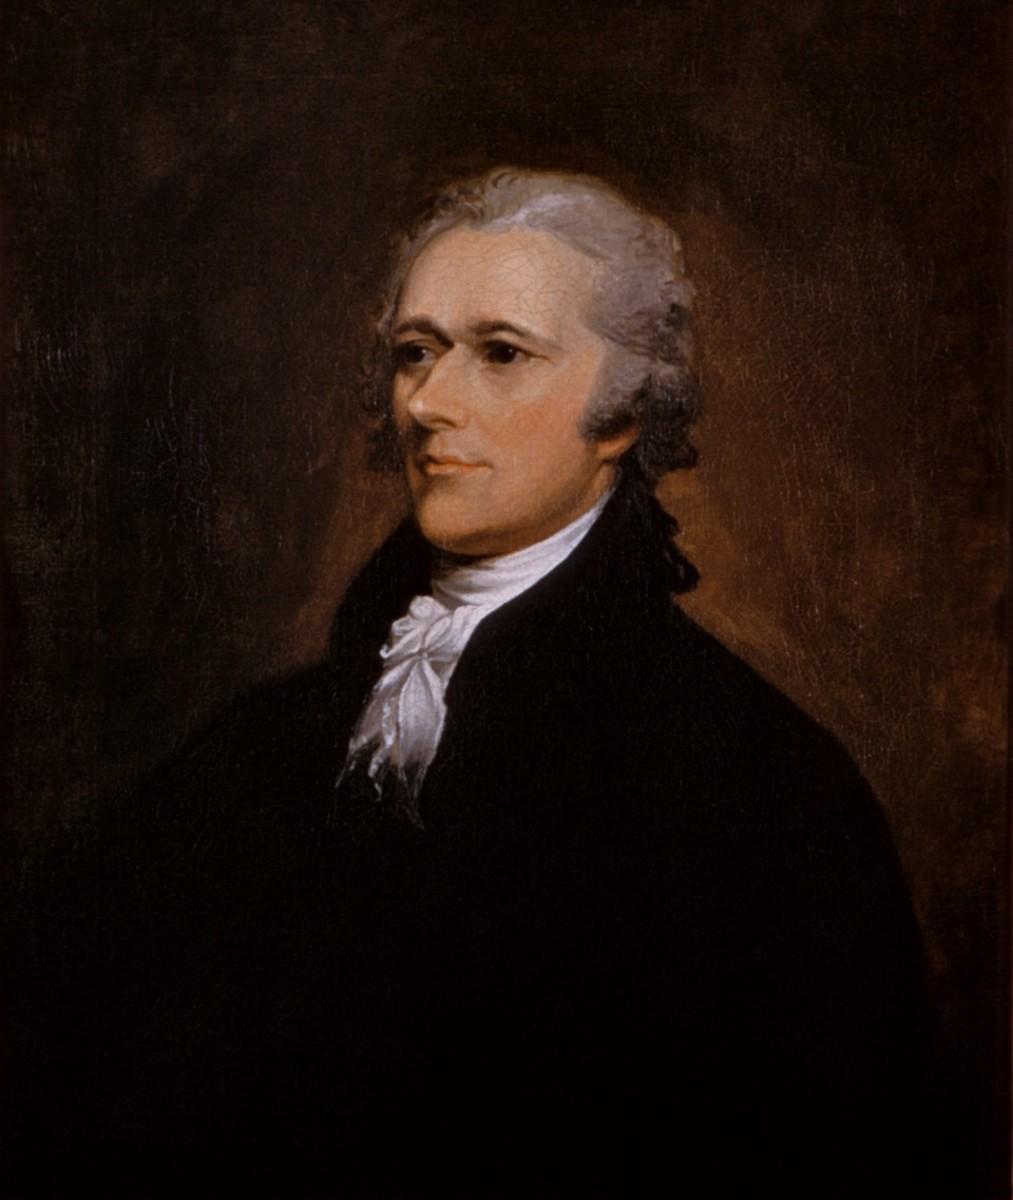 Portrait of Alexander Hamilton.